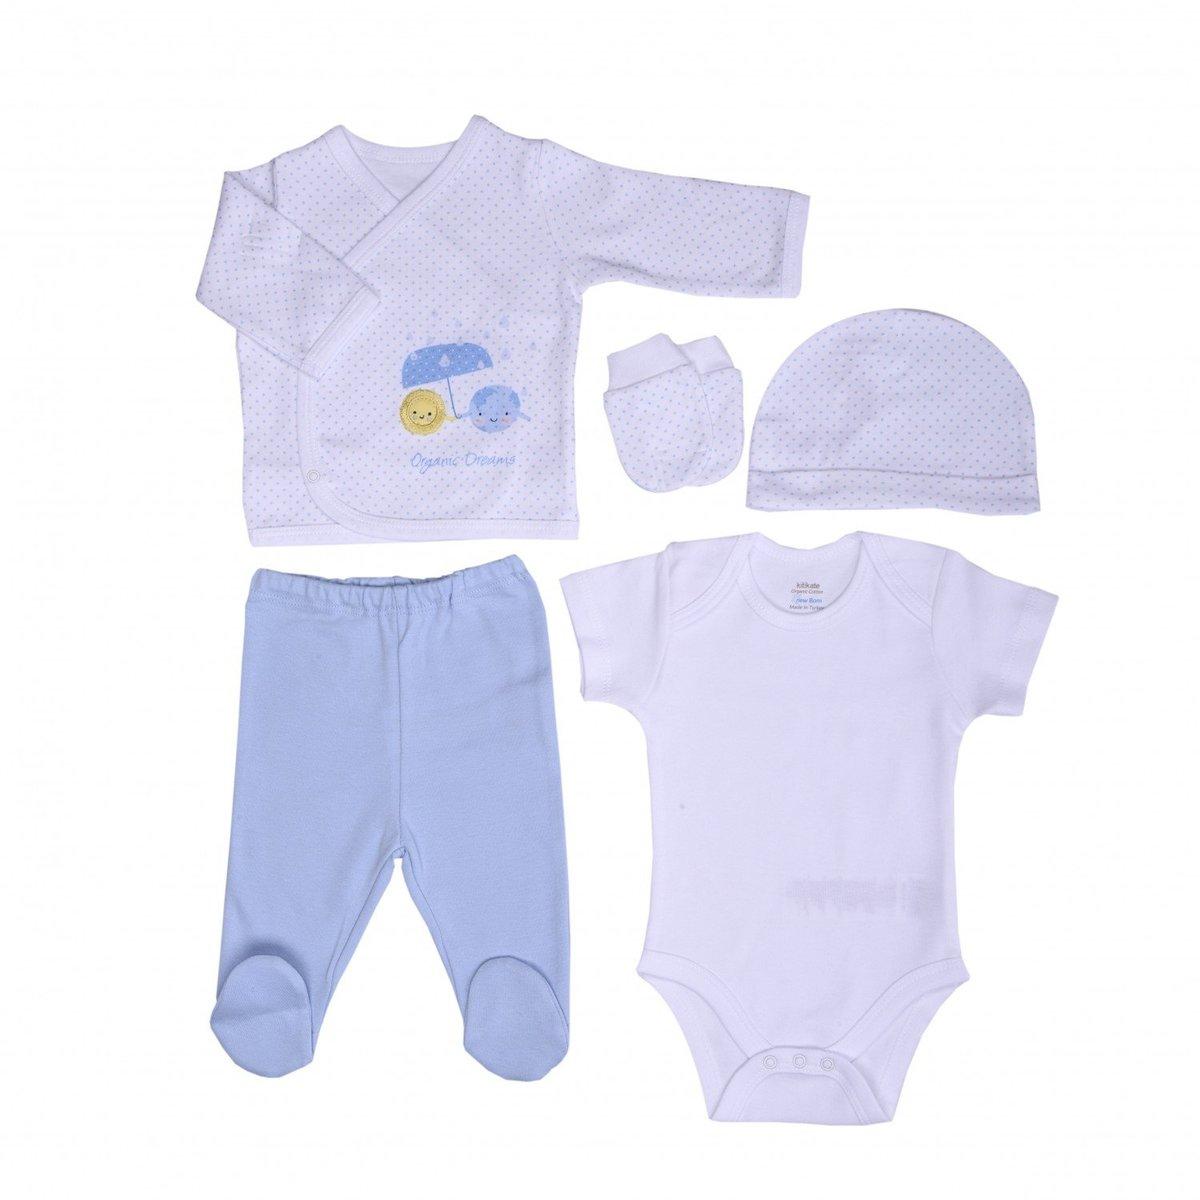 Newborn Set 5pcs -Dream (Blue)